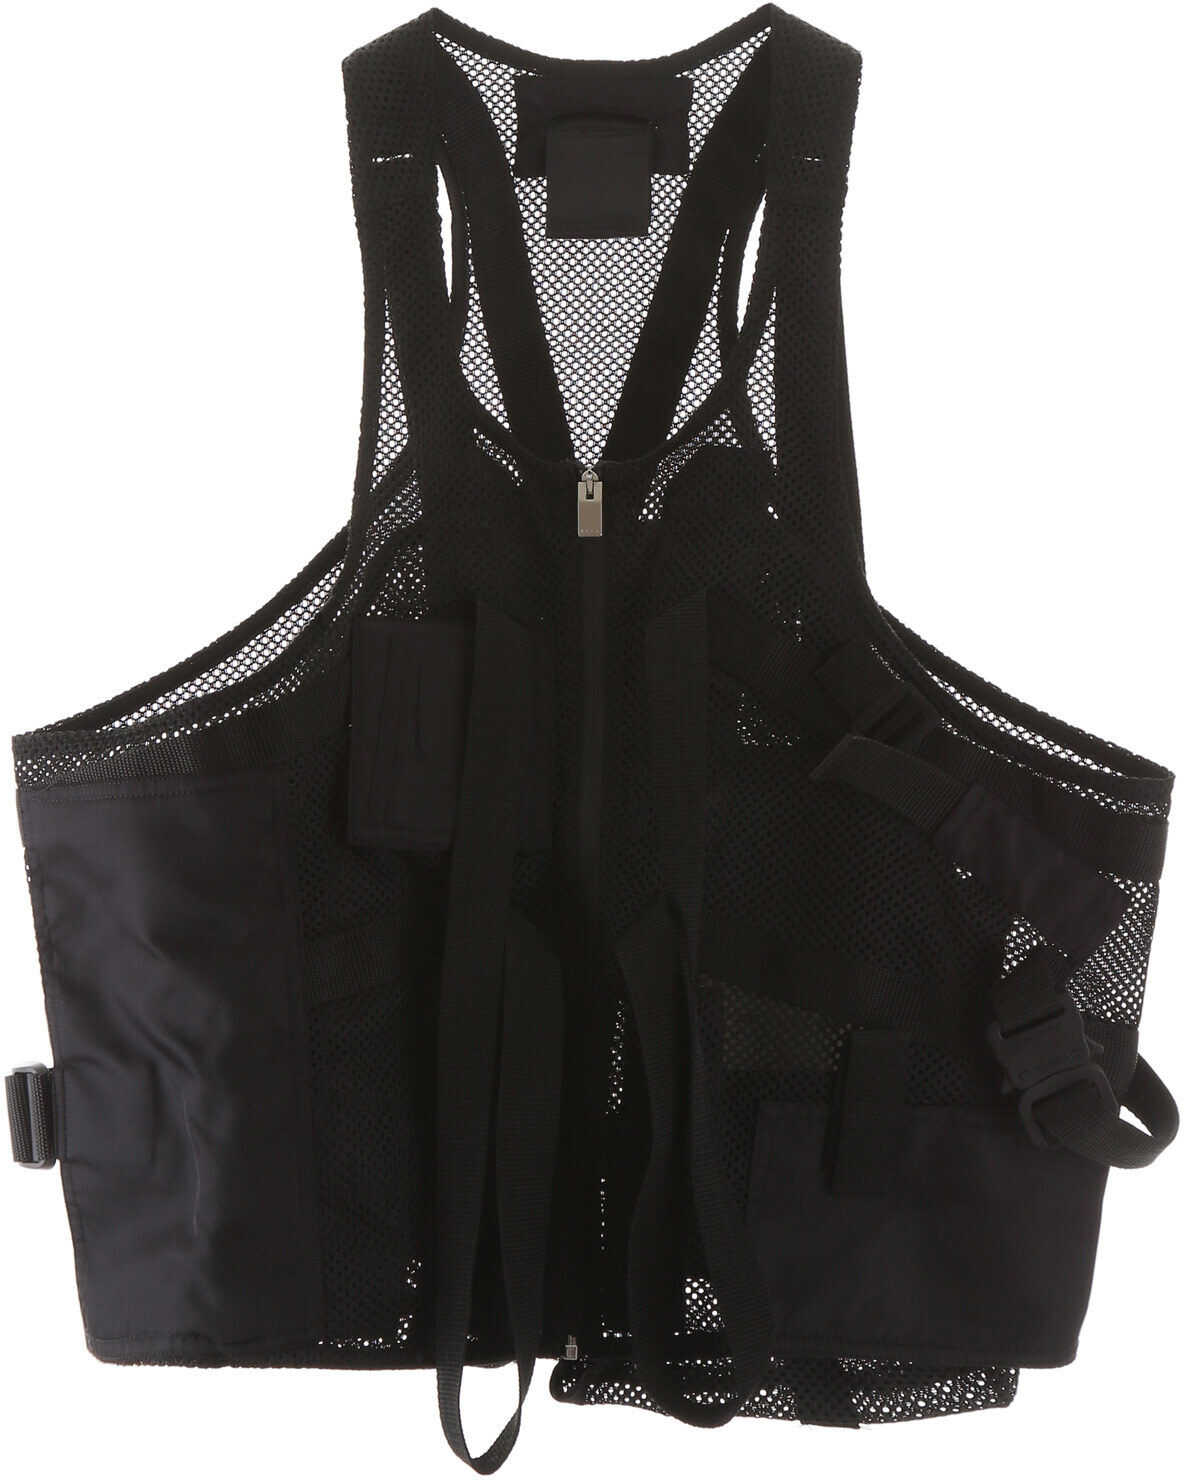 Alyx 1017 9Sm Tactical Vest BLACK